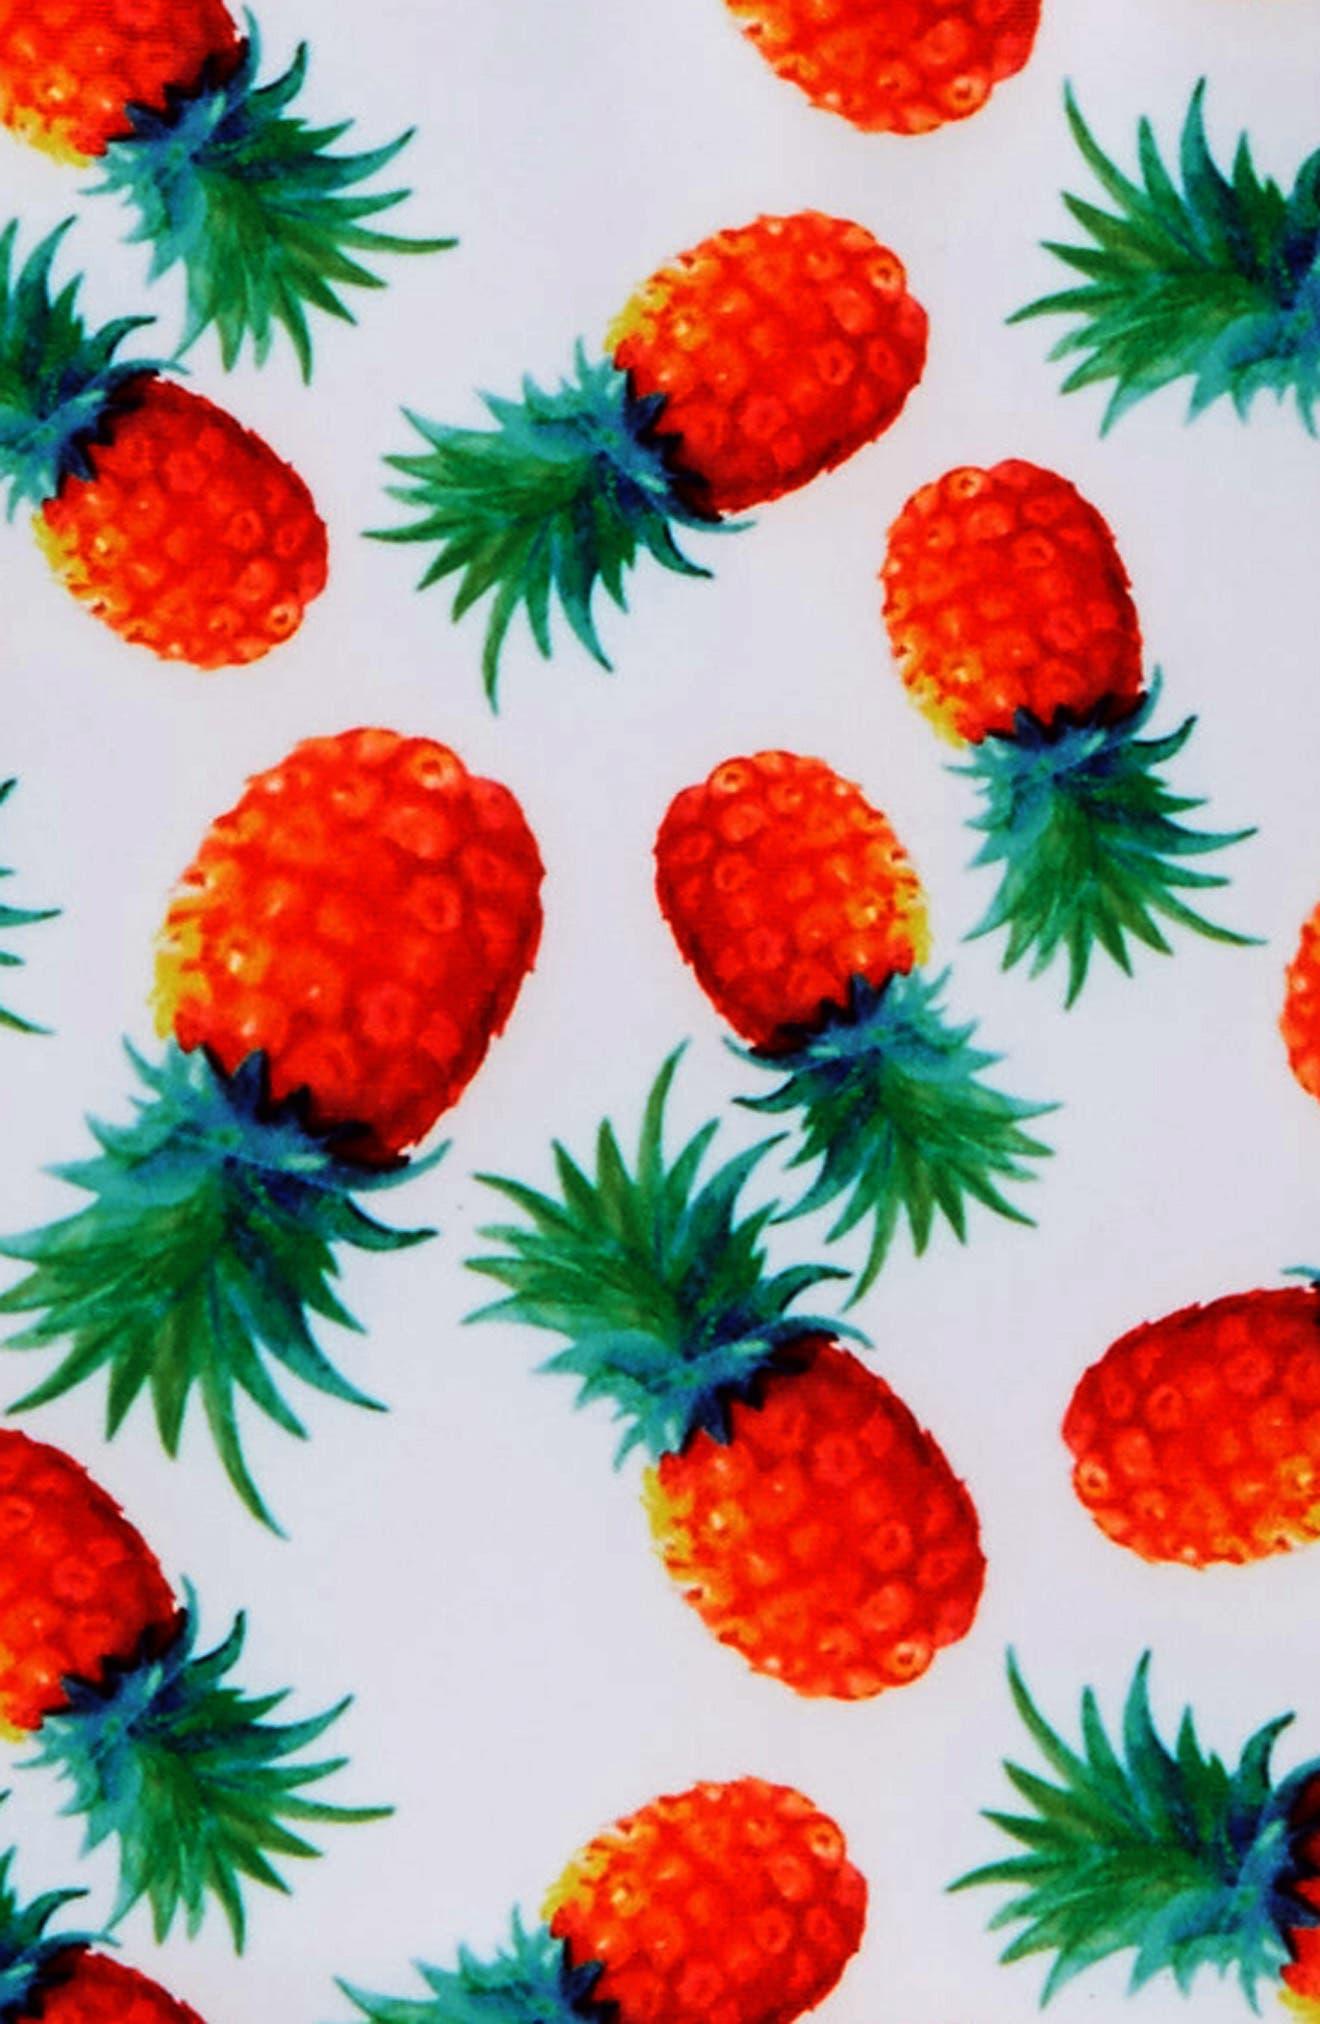 Pineapple Disco Two-Piece Rashguard Swimsuit,                             Alternate thumbnail 2, color,                             109